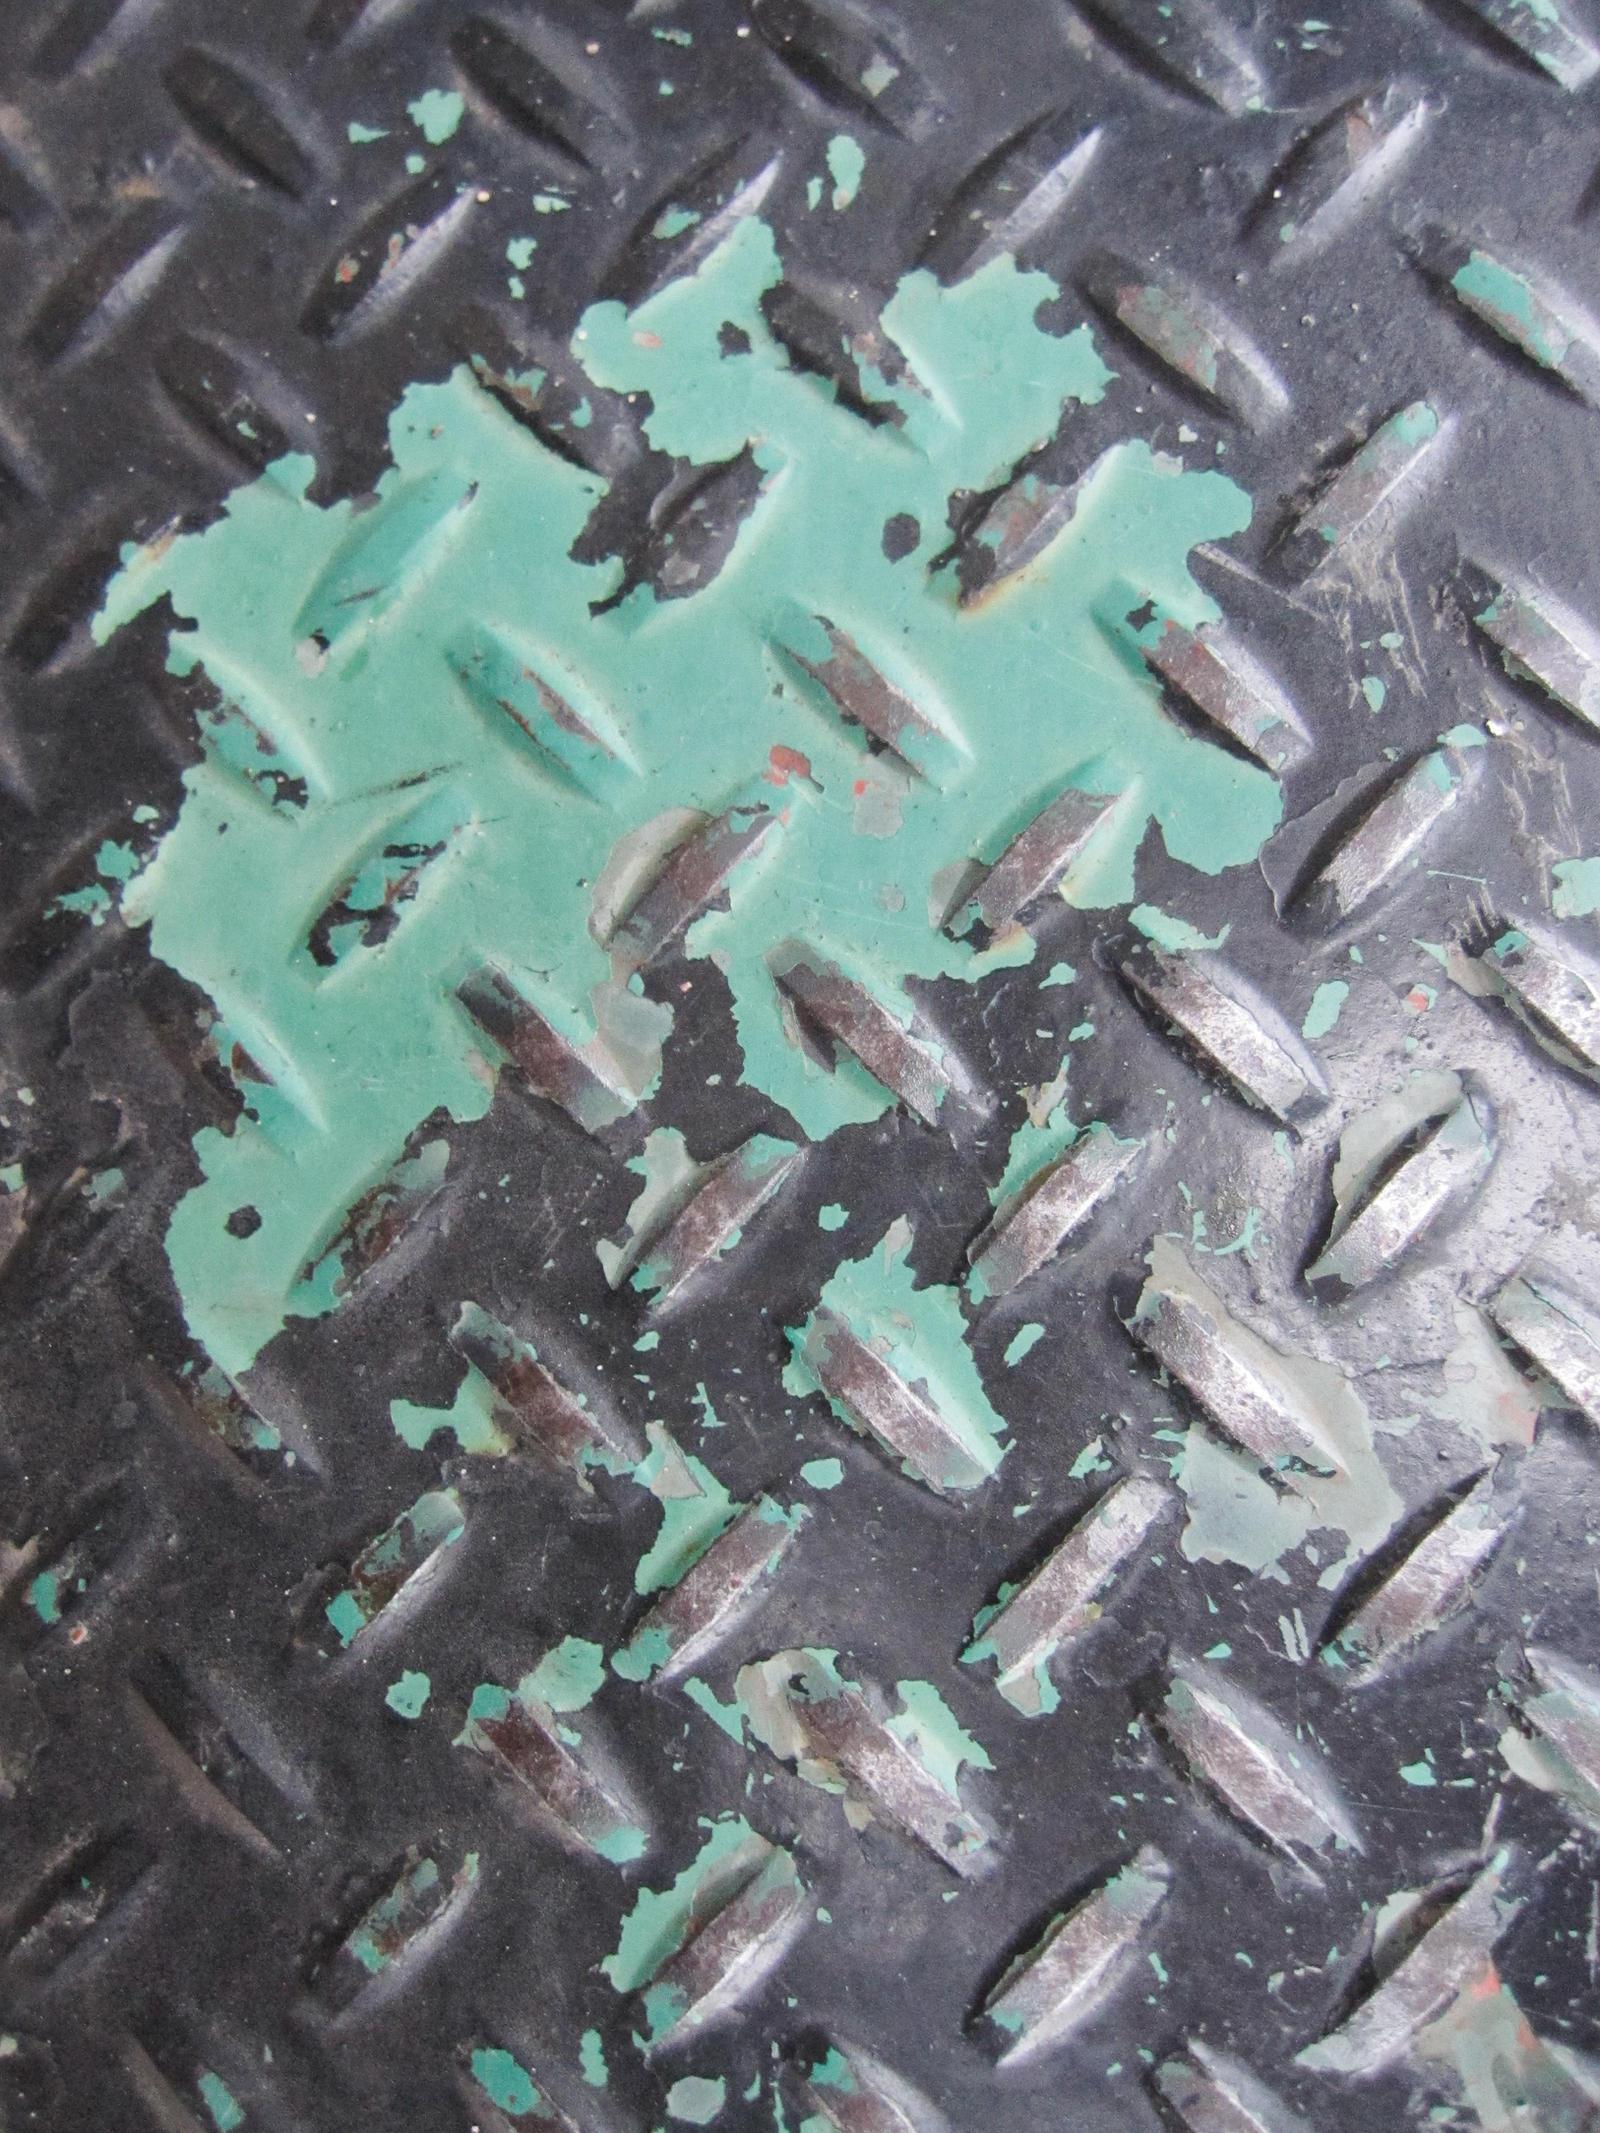 Peeling Paint on Diamond Plate by element321